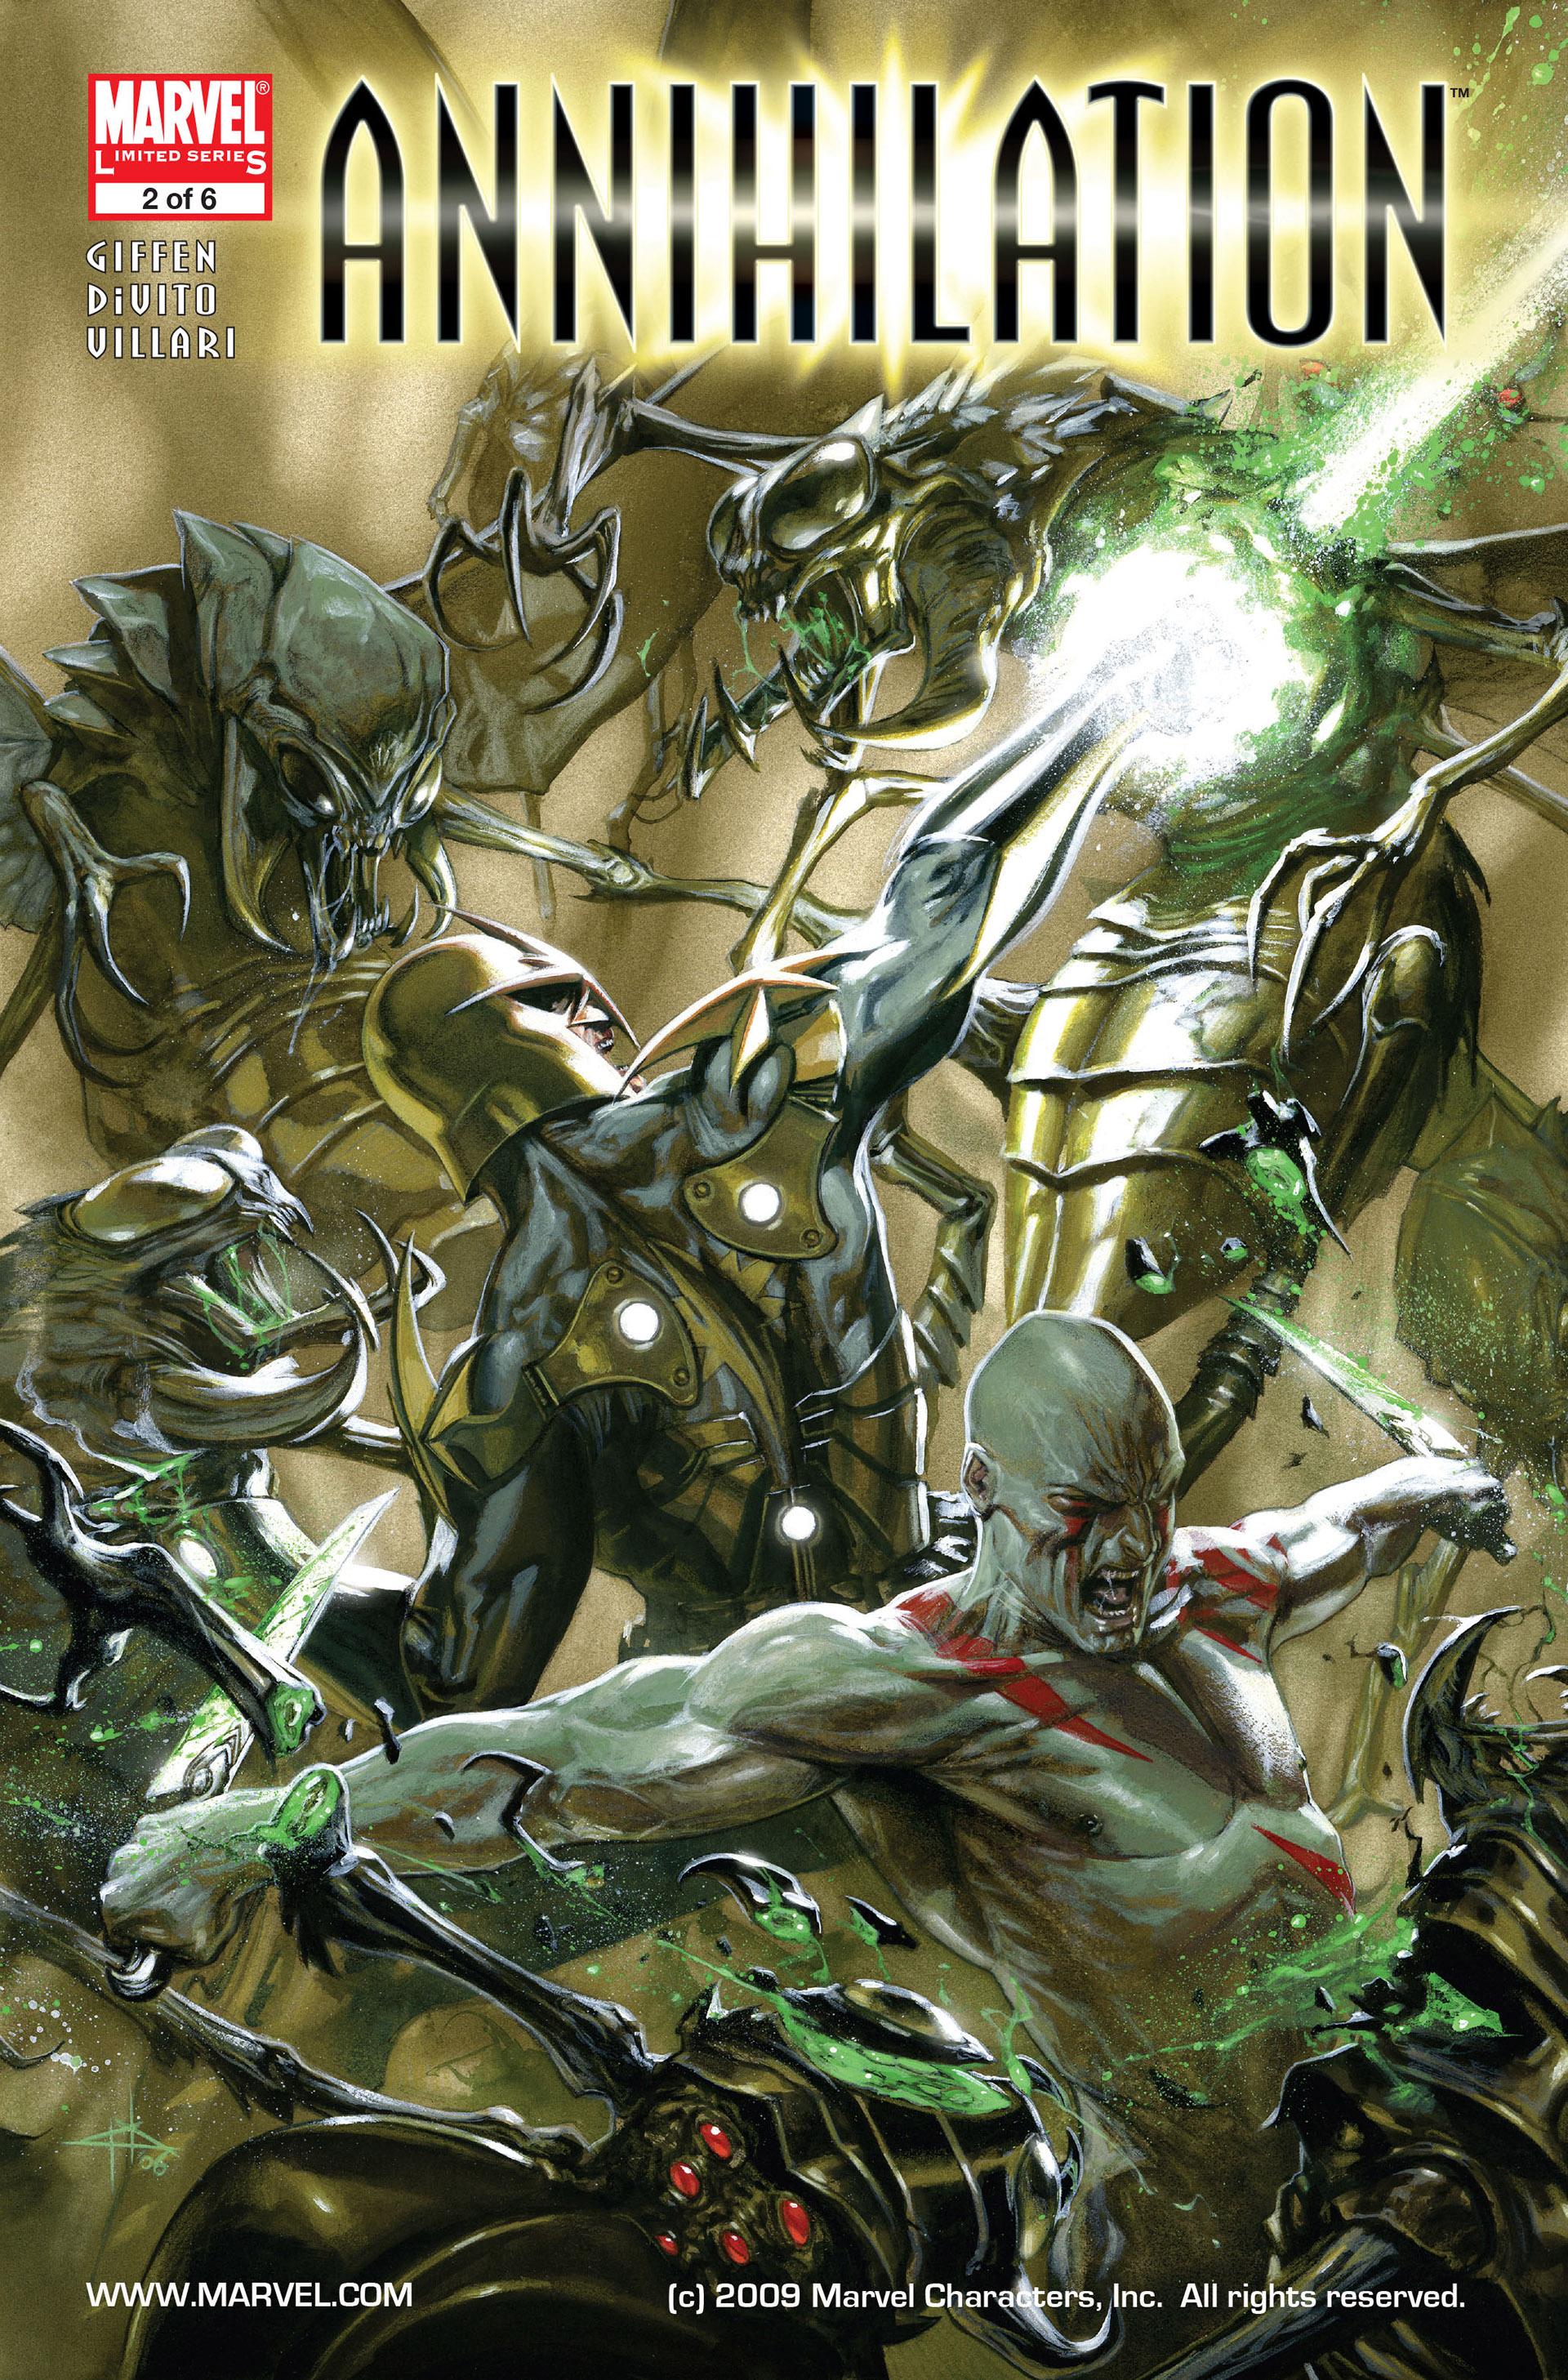 Read online Annihilation comic -  Issue #2 - 1